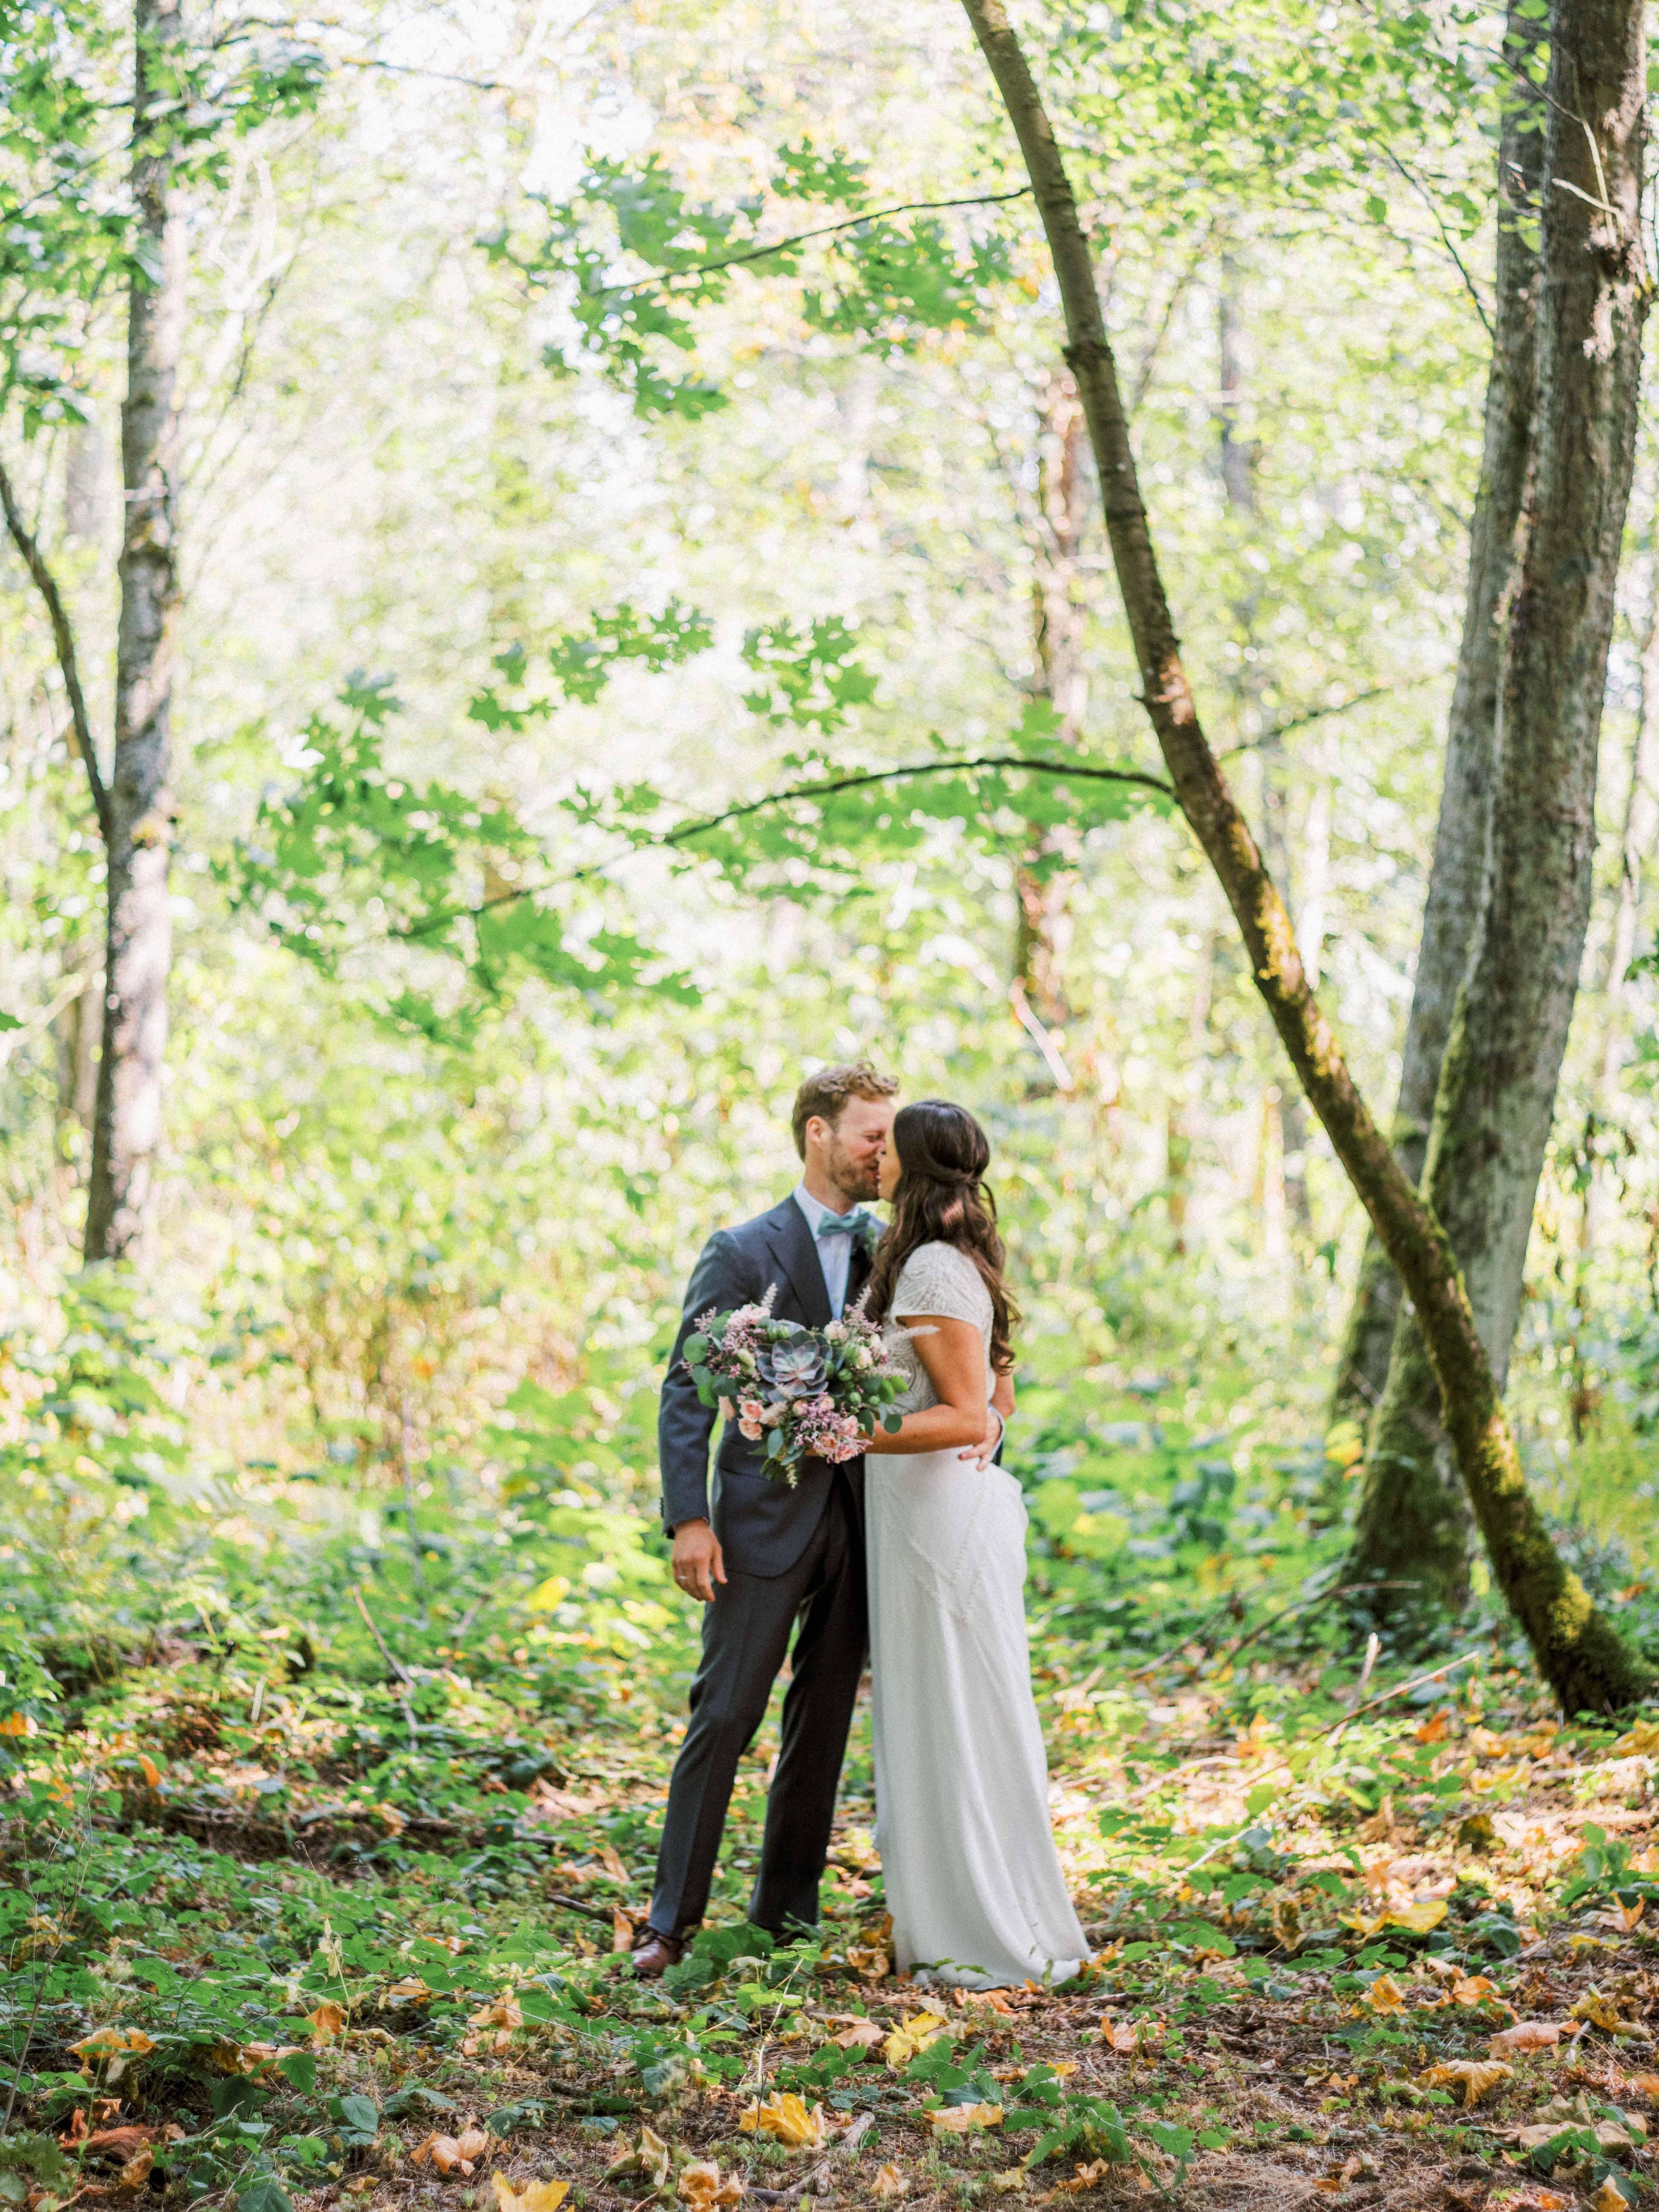 Wedding couple in forest  - Woodmark Hotel Wedding by Flora Nova Design Seattle